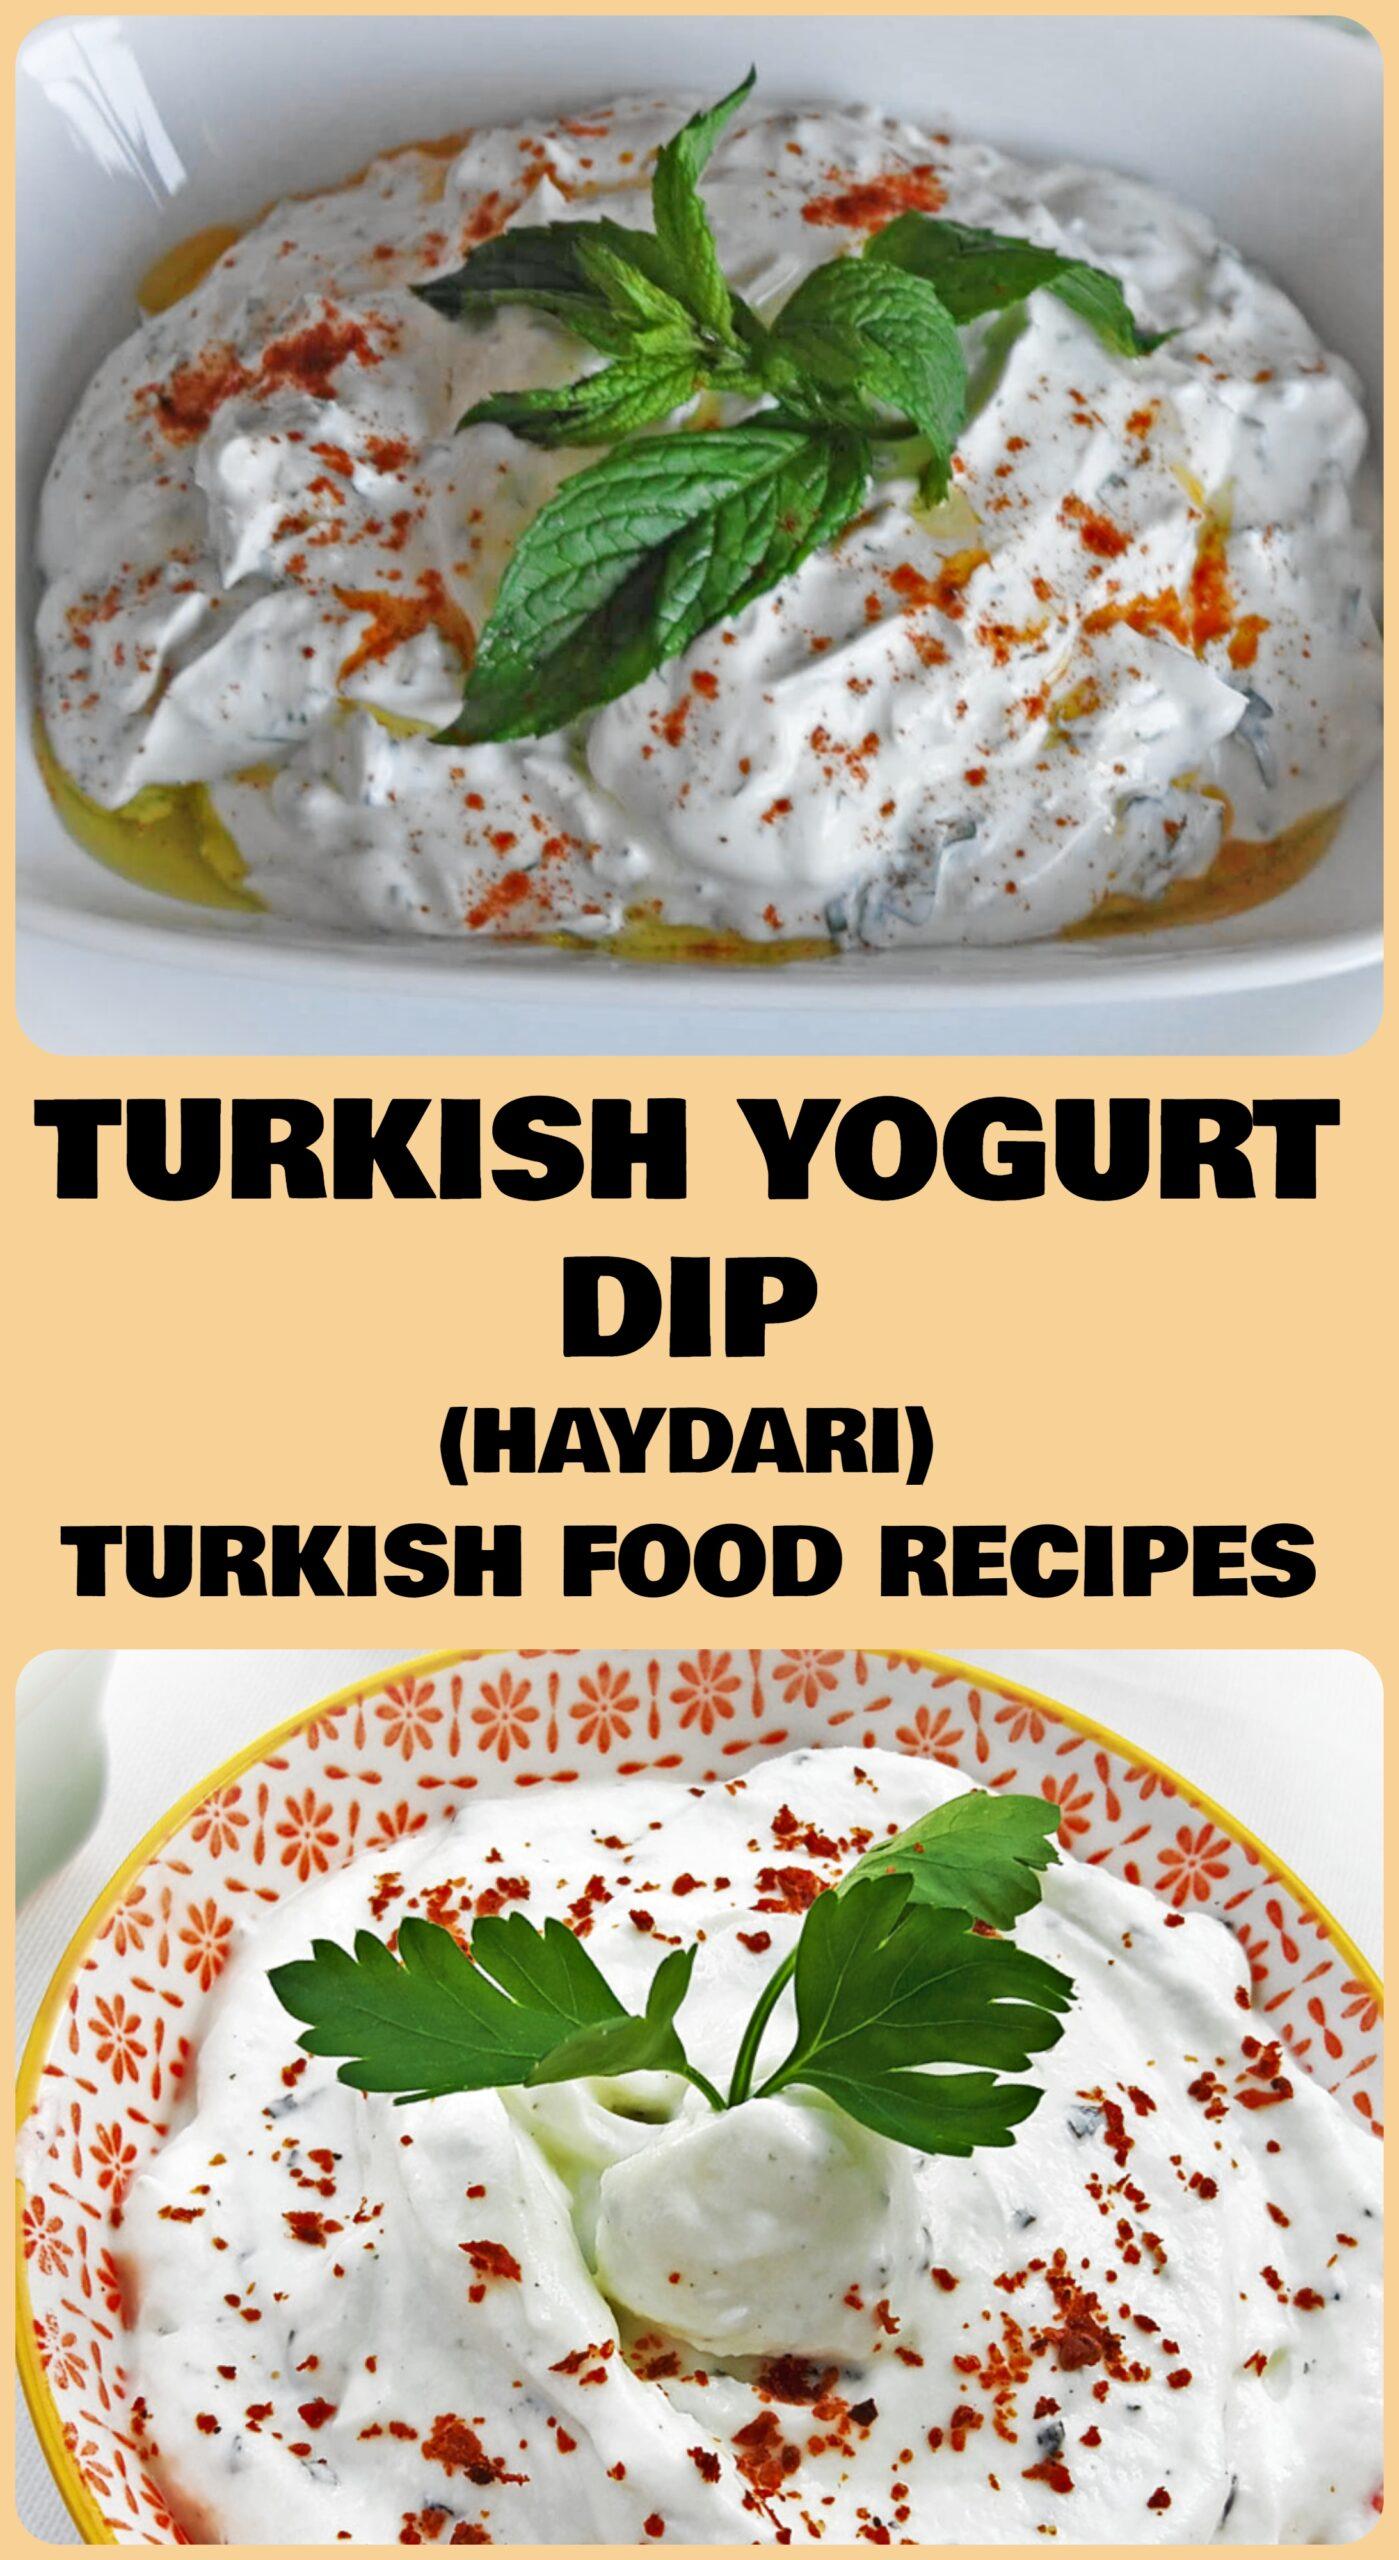 Turkish Yogurt Dip - Haydari Recipe